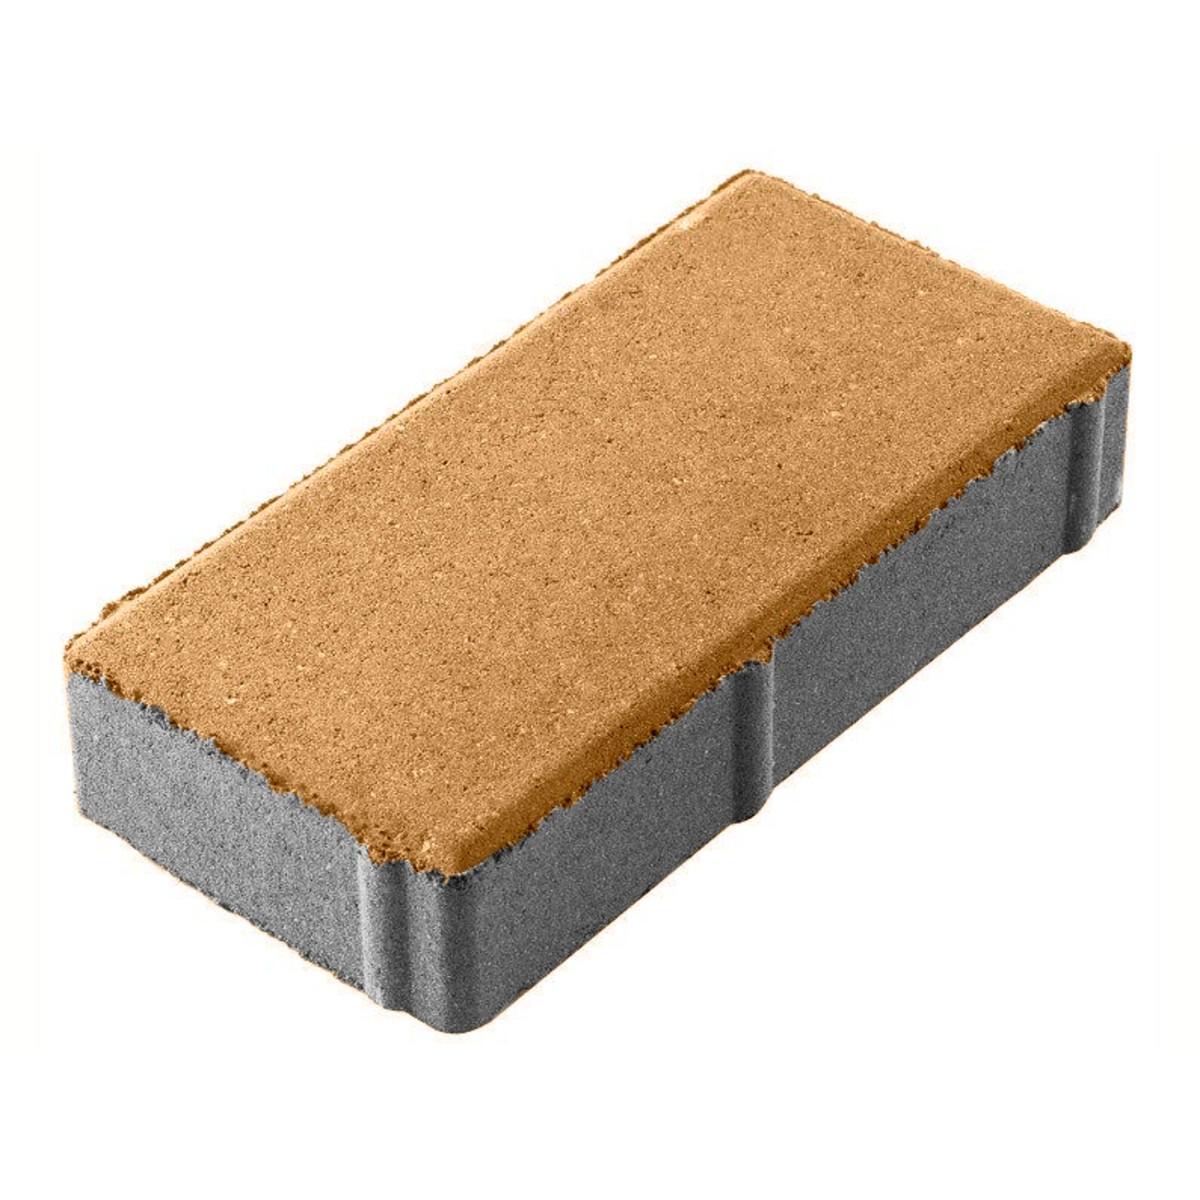 Плитка тротуарная 100х200х40 мм горчица двухслойная